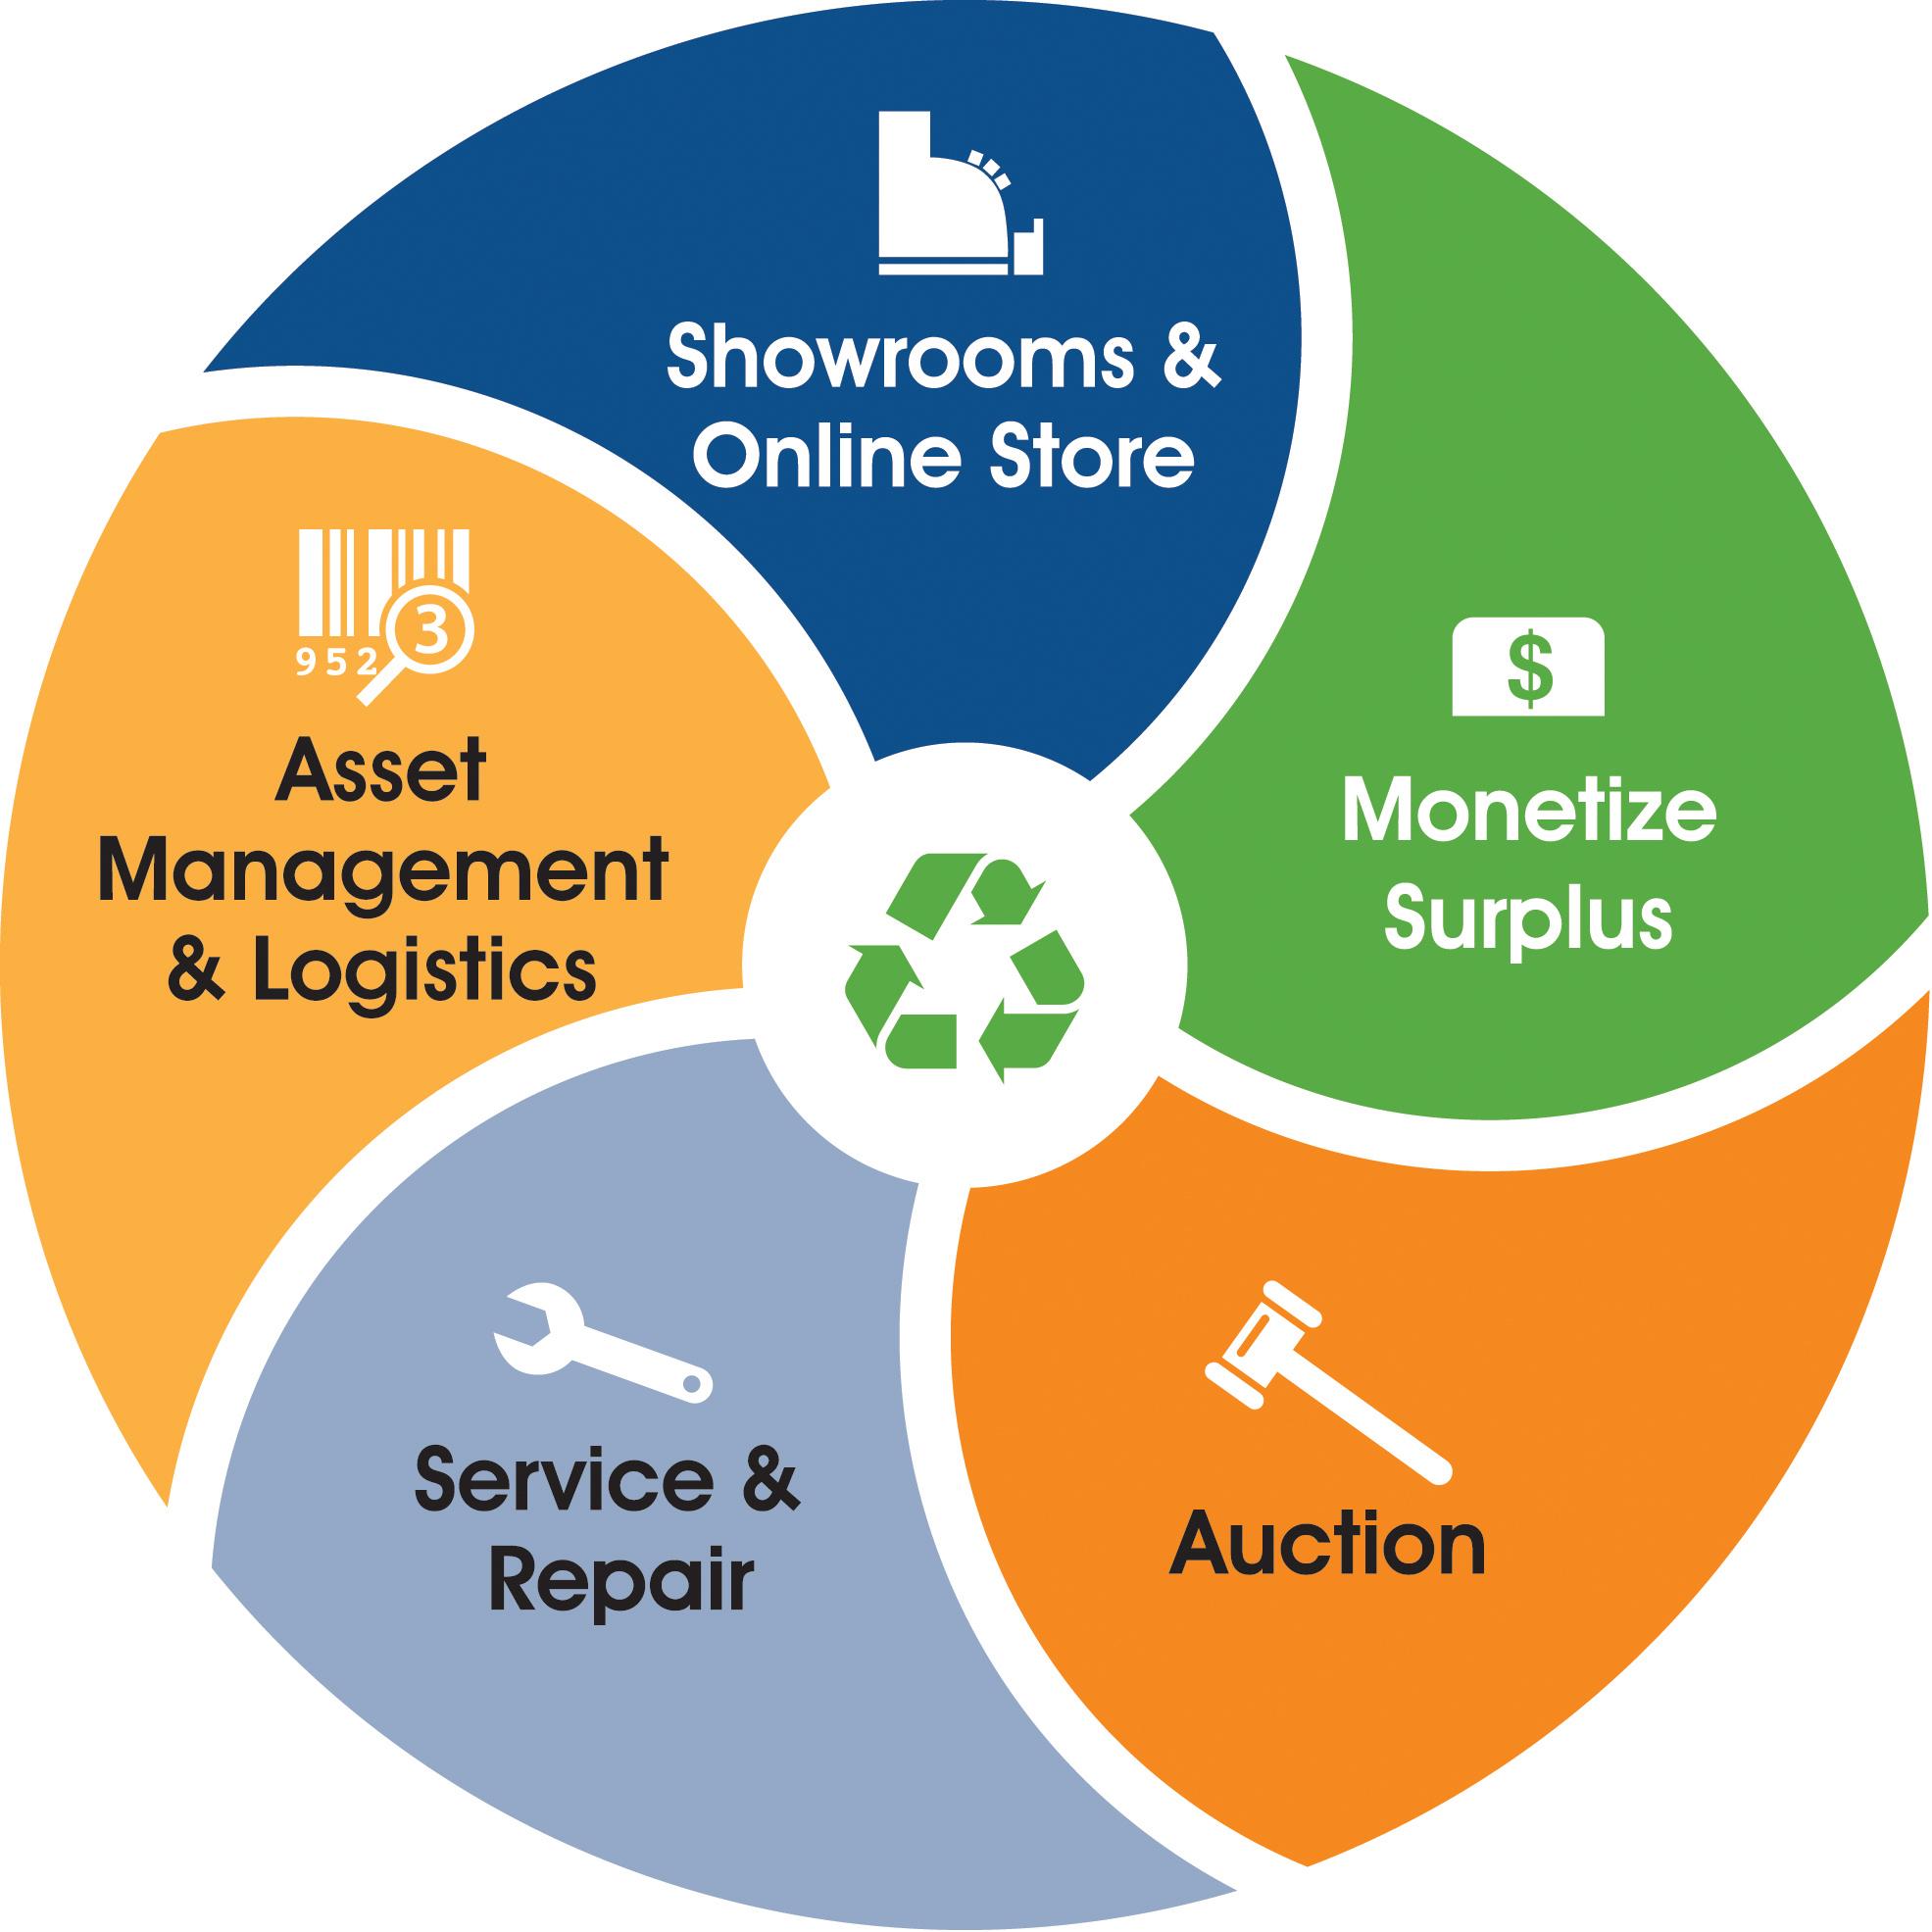 BioSurplus To Host First-Ever All-Warranty Lab Equipment